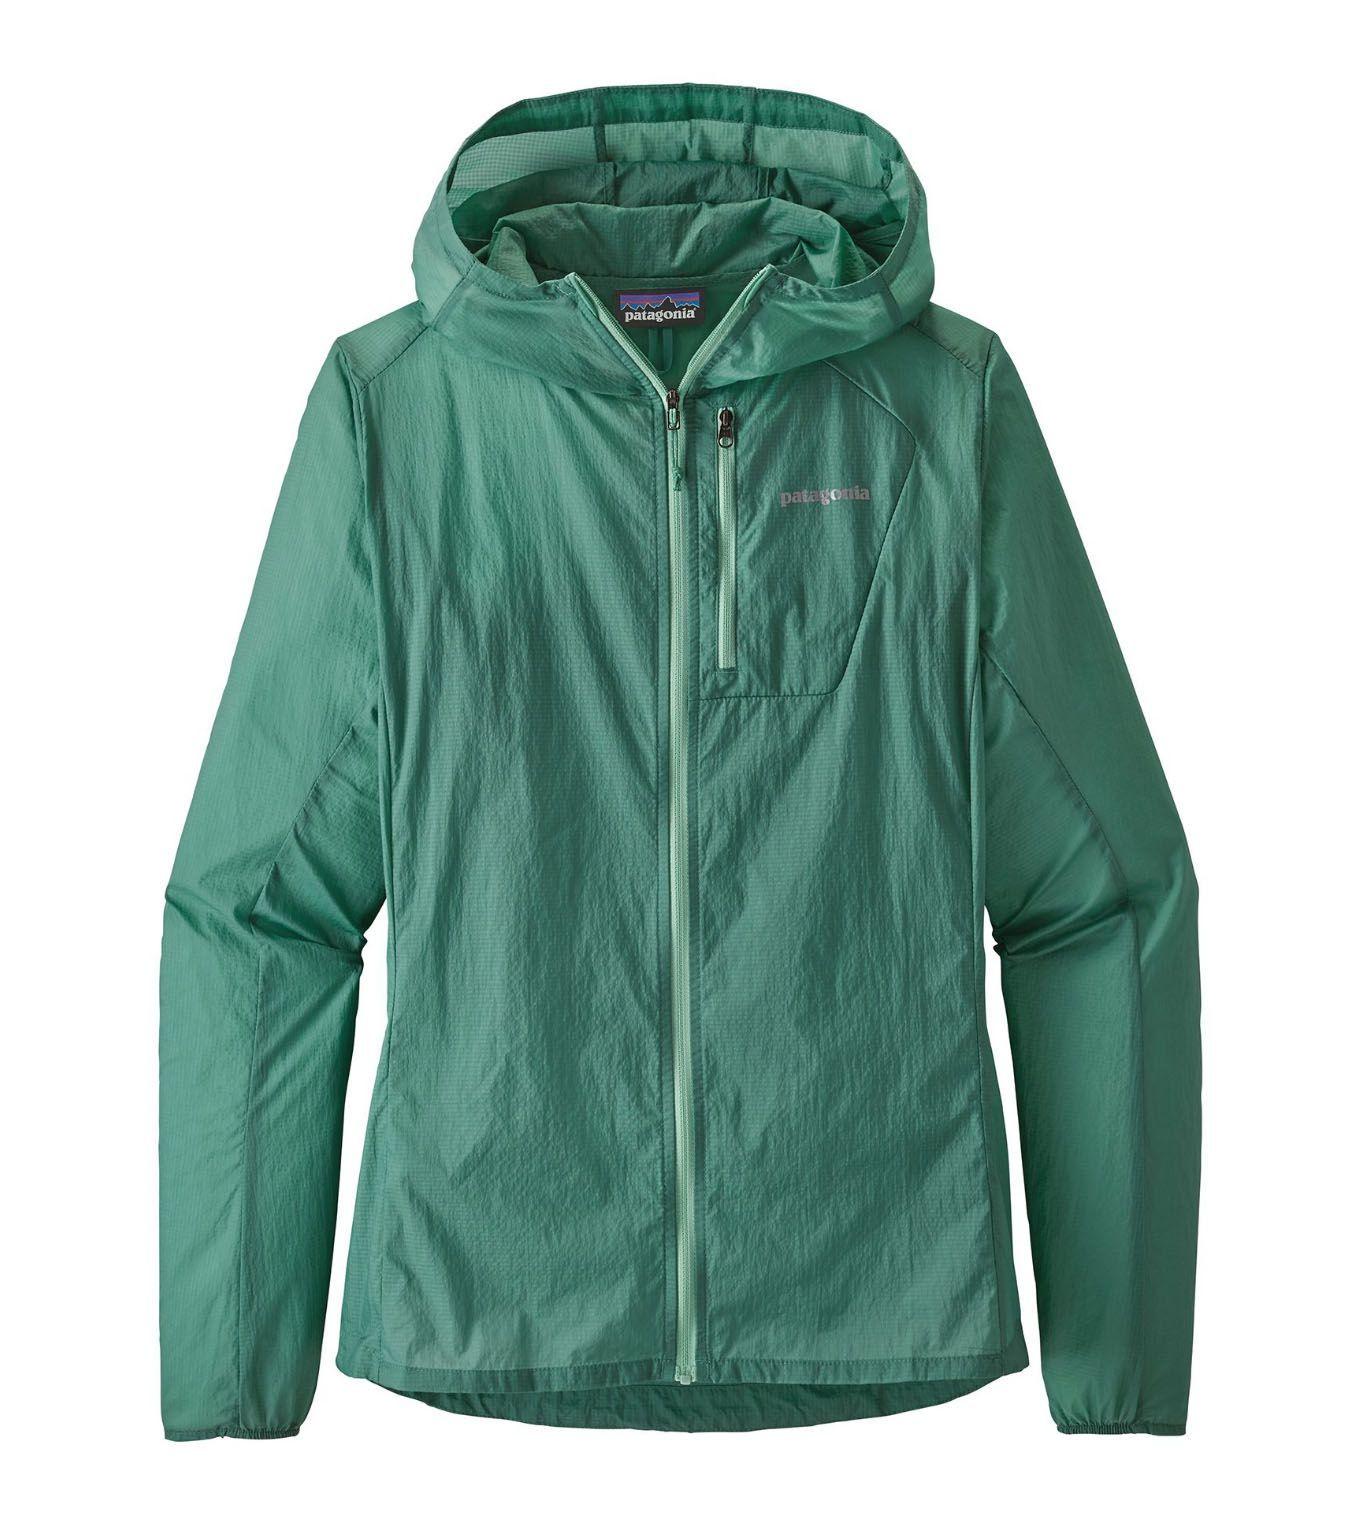 c1abc1725 Lightweight Jackets for Running – Packable Rain Jackets 2019